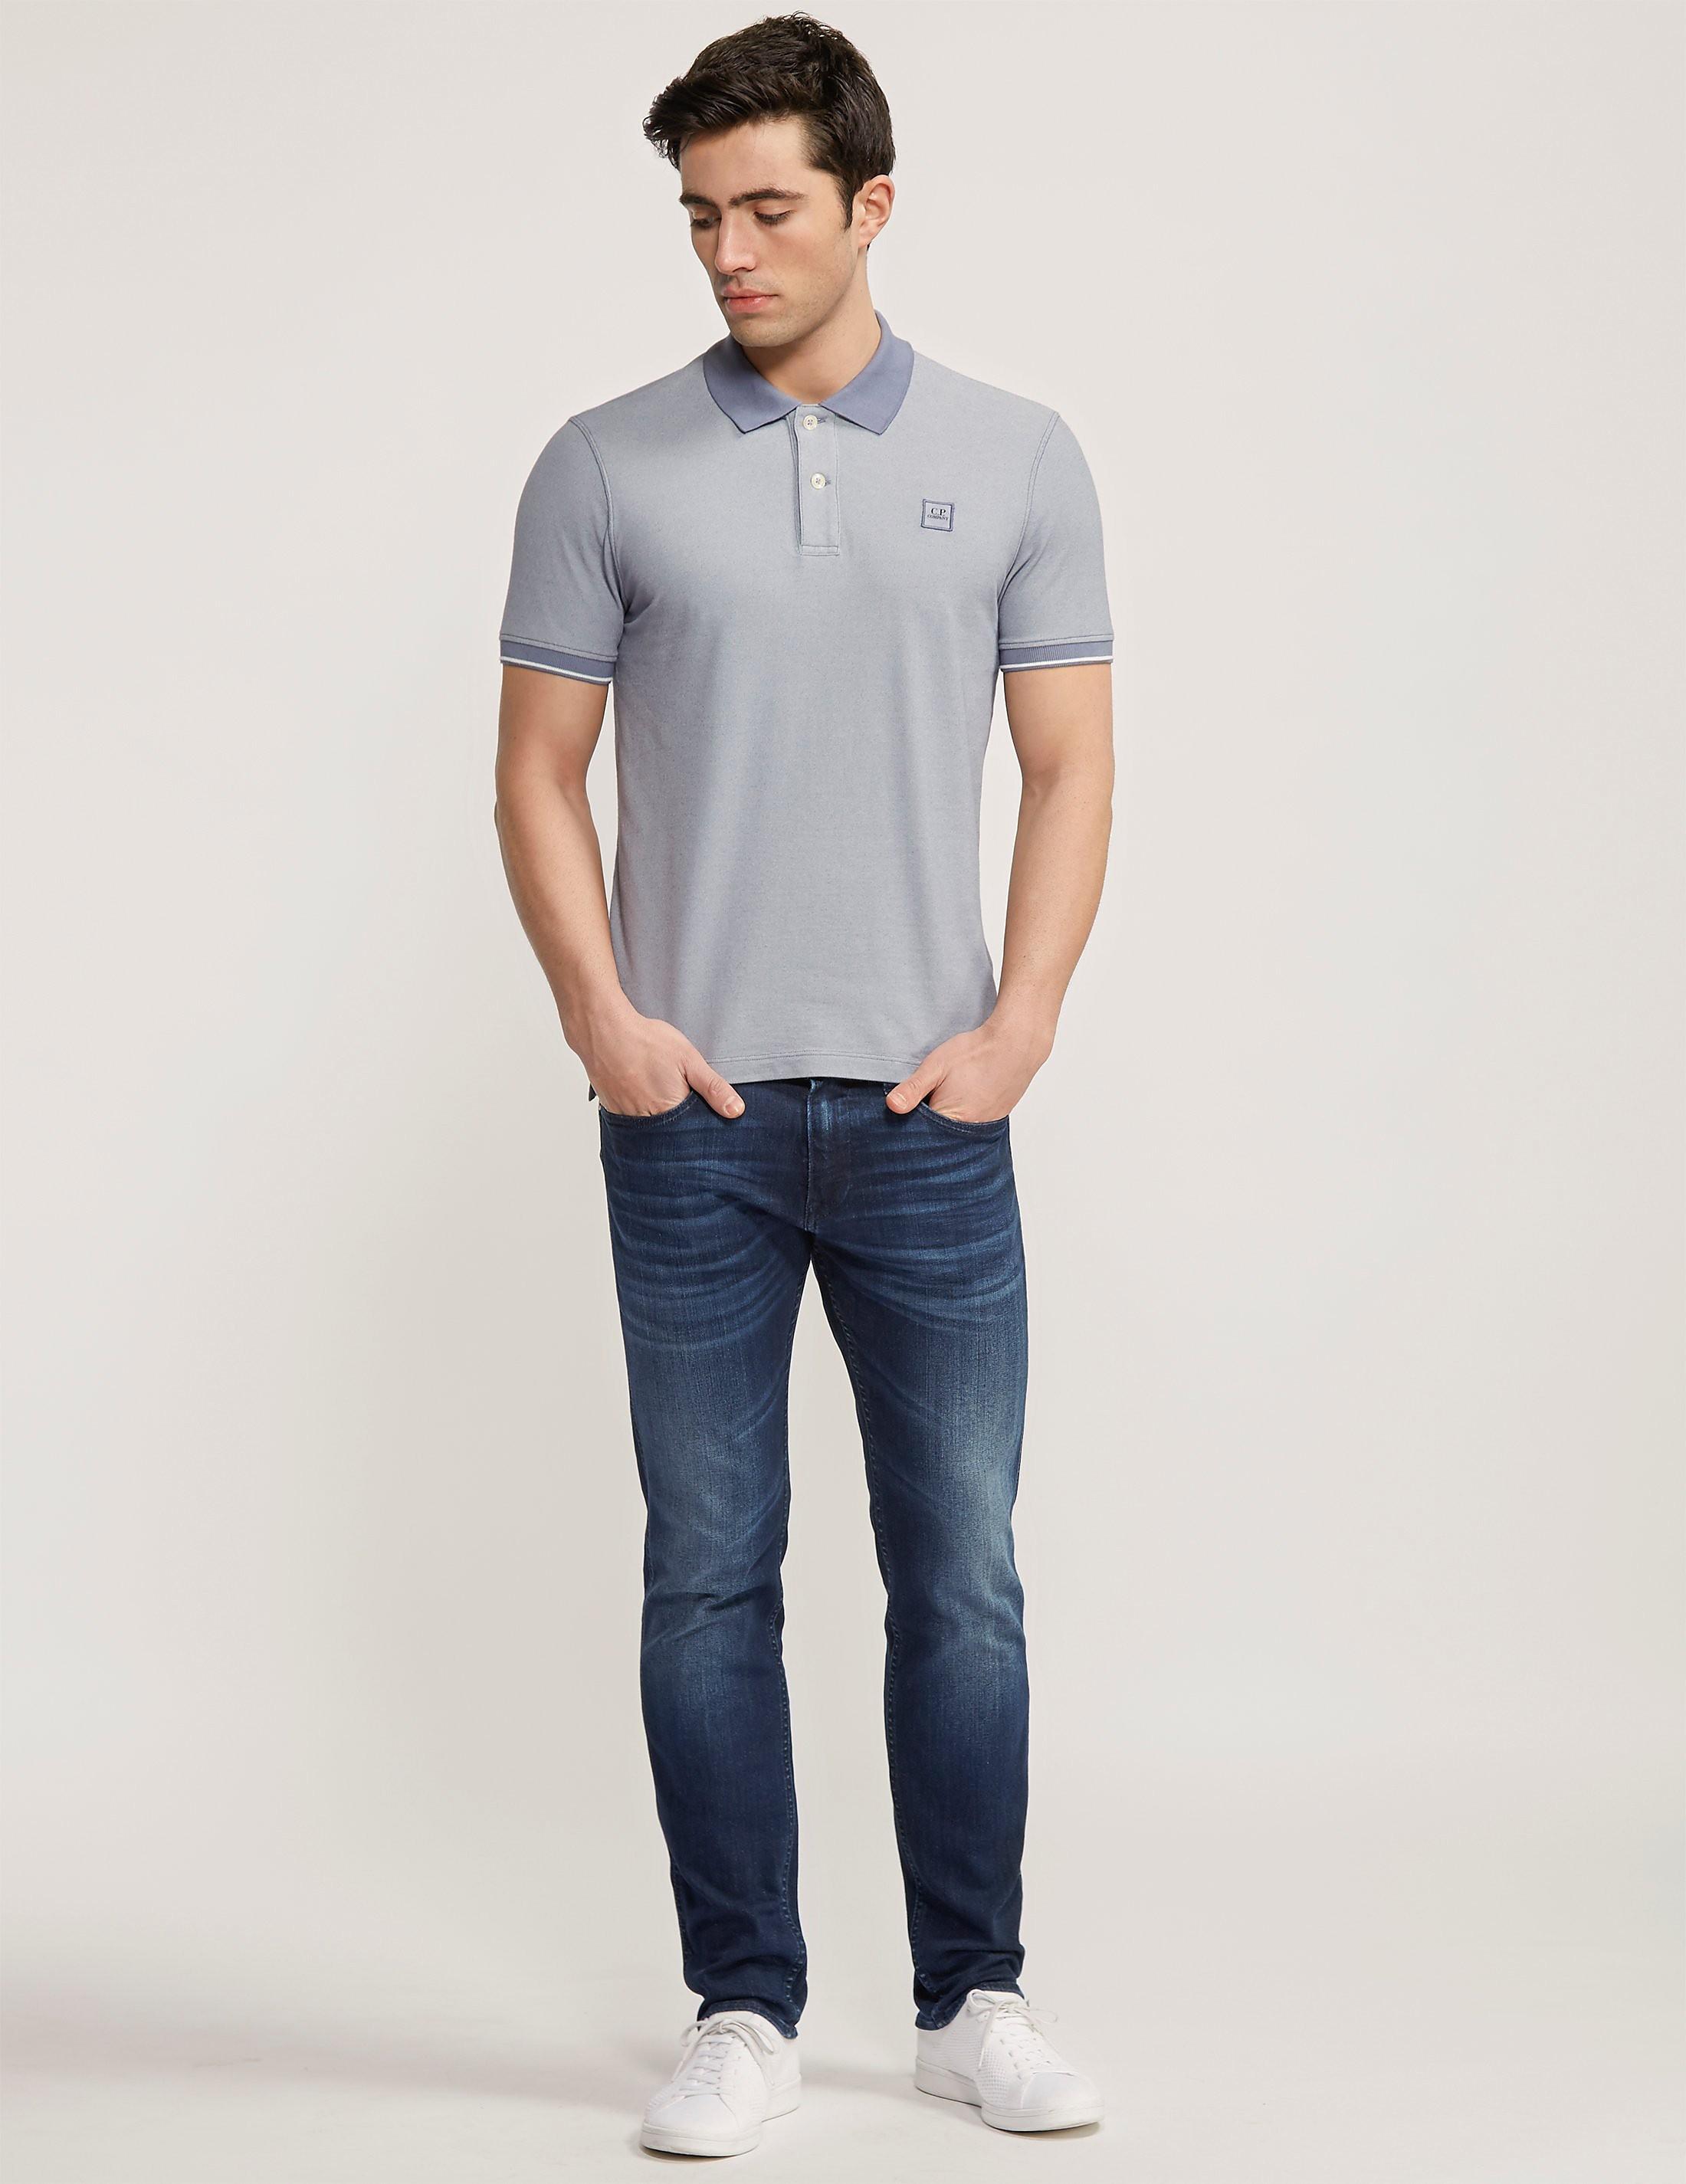 CP Company Polo Shirt